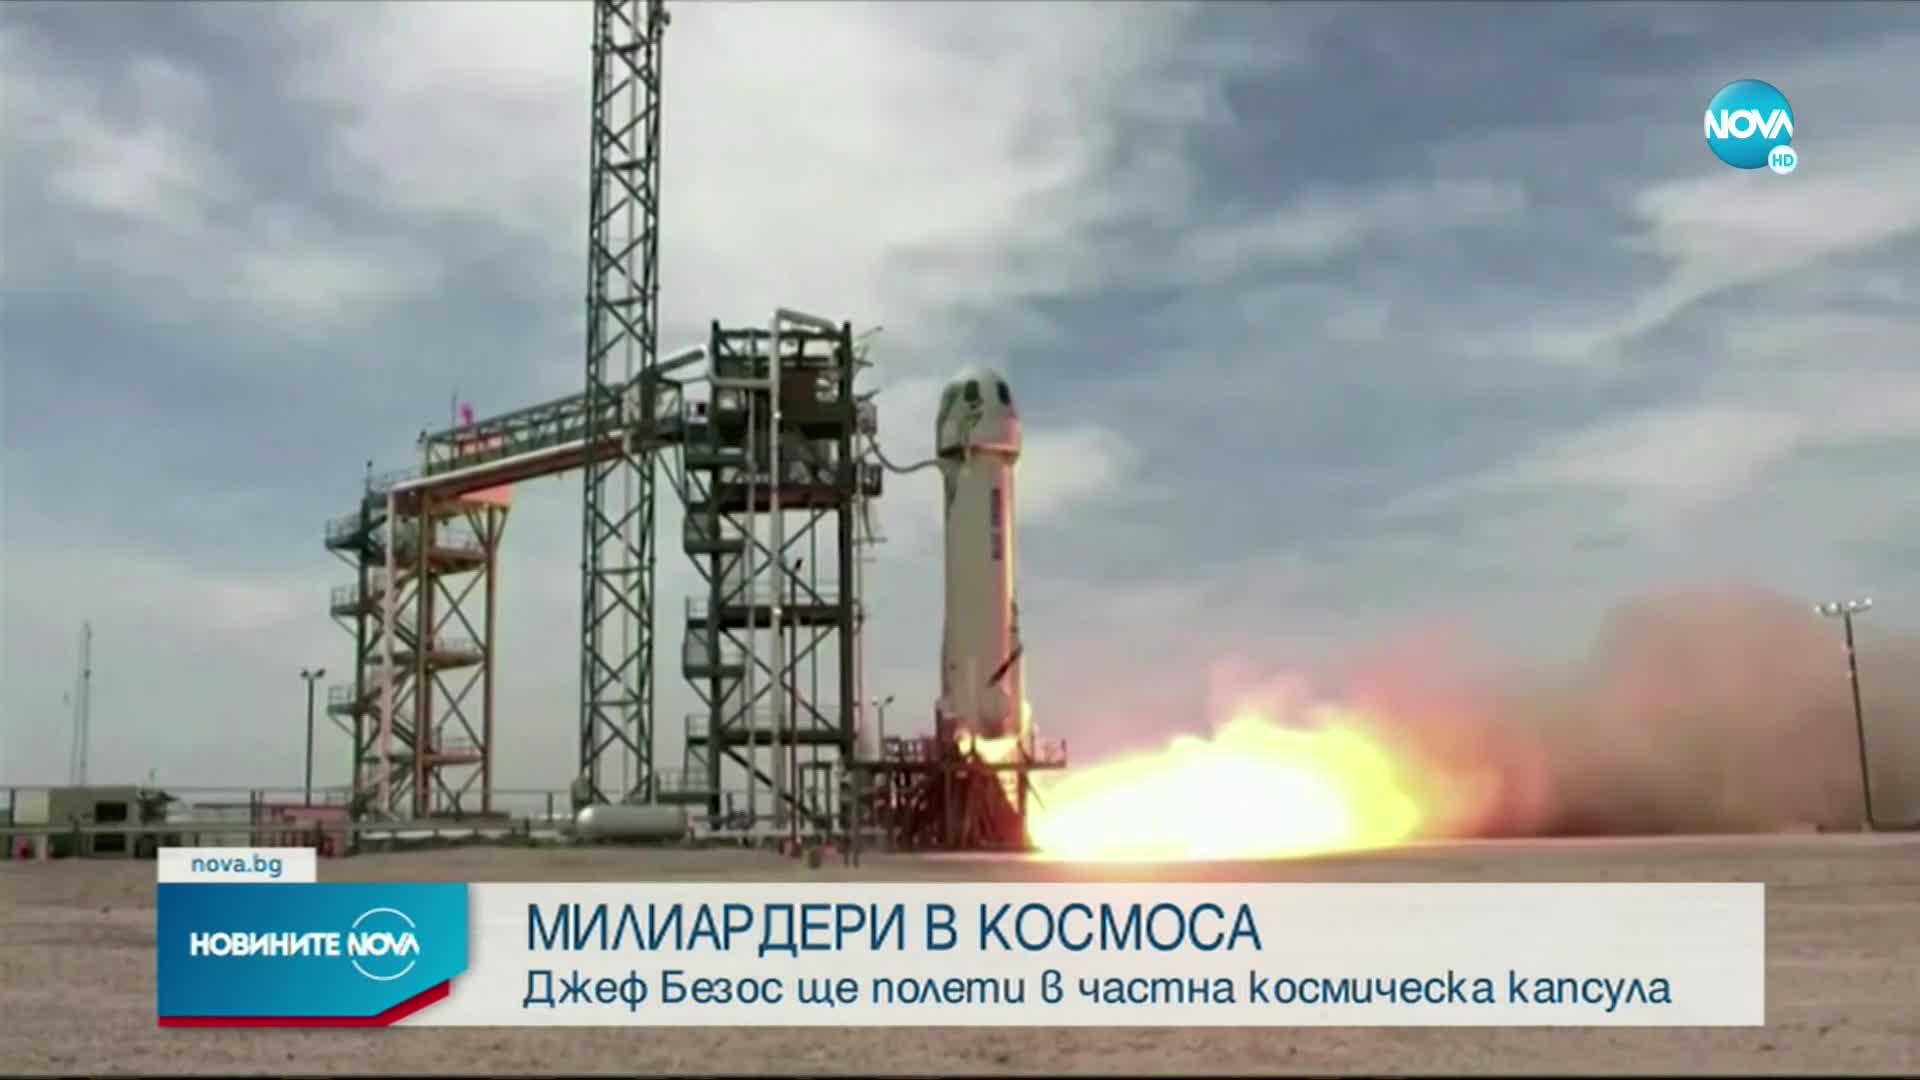 Джеф Безос ще полети в космоса с частна капсула